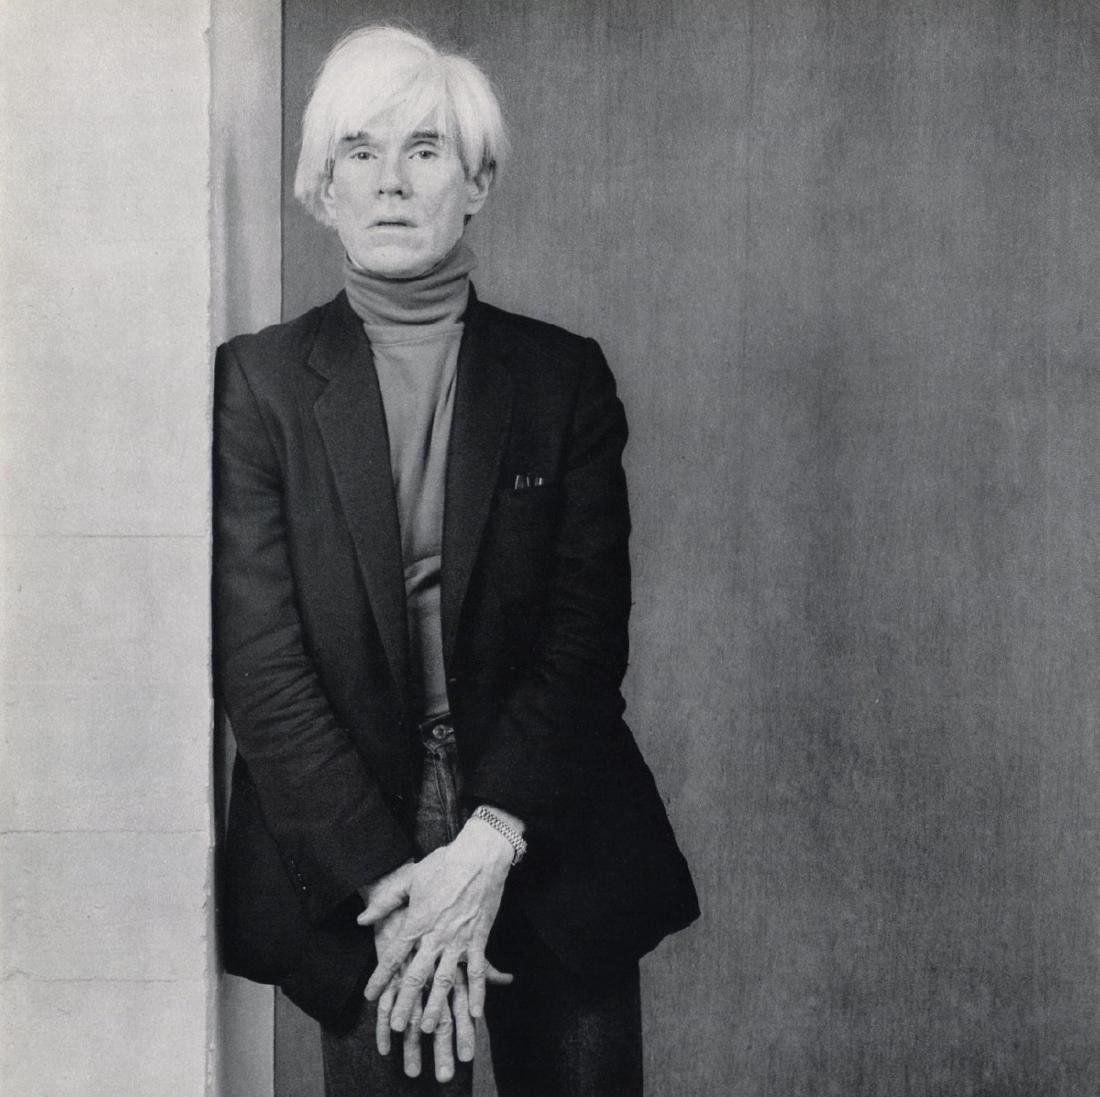 ROBERT MAPPLETHORPE - Andy Warhol, 1983